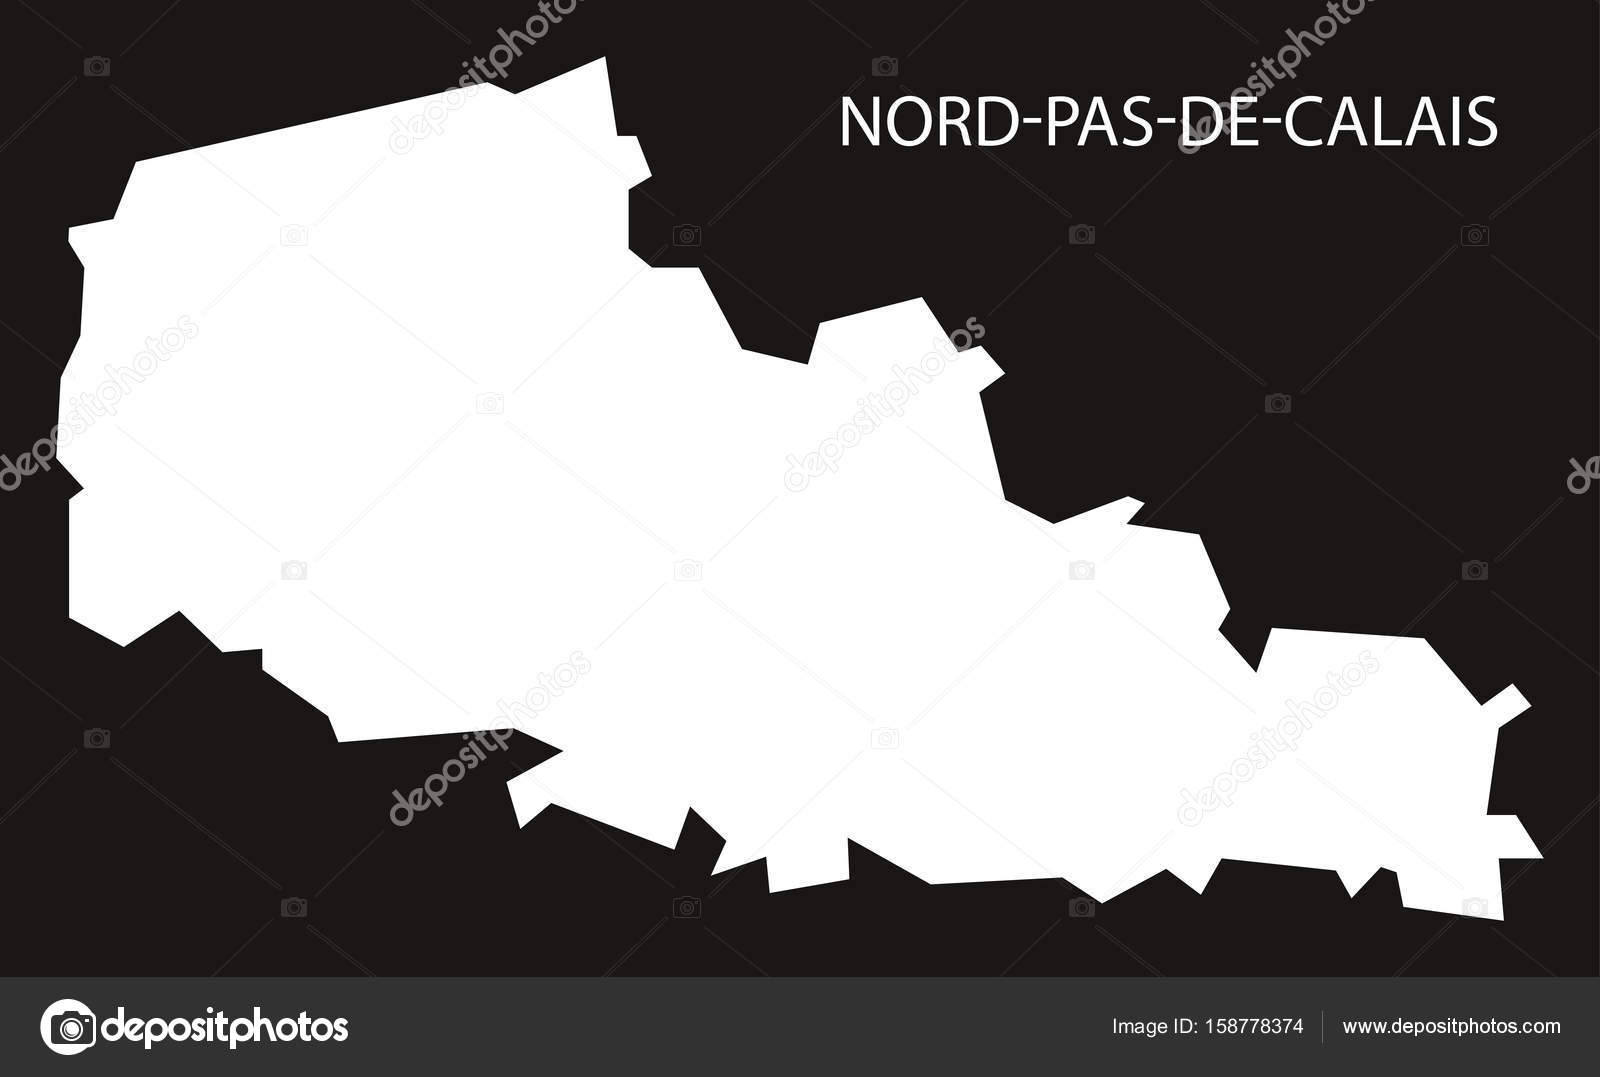 NordPasdeCalais France map black inverted silhouette illustra